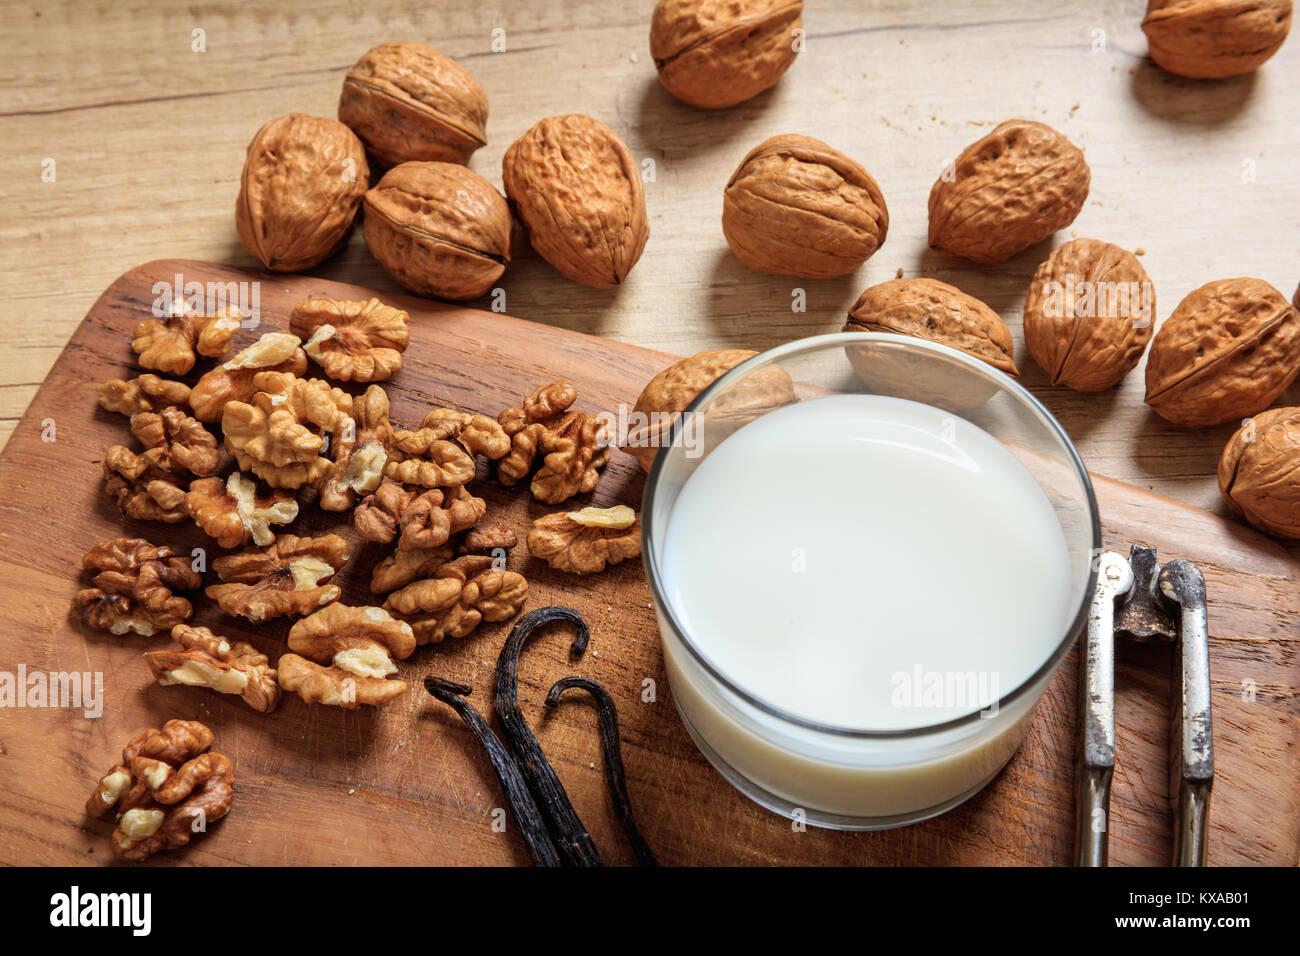 Vegan leche de nueces sobre una superficie de madera Imagen De Stock